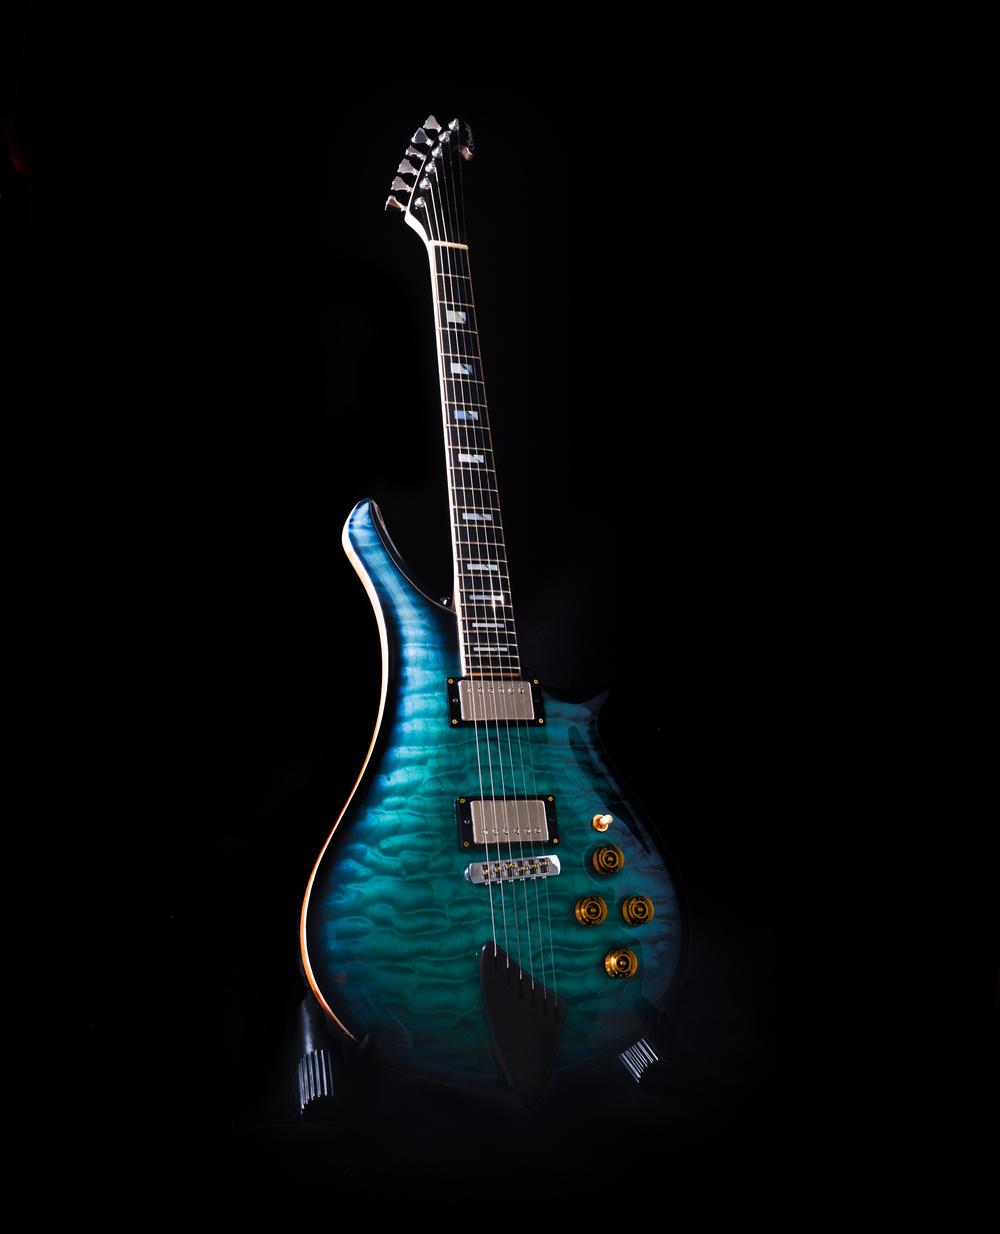 2013-03-18-guitar-041.jpg